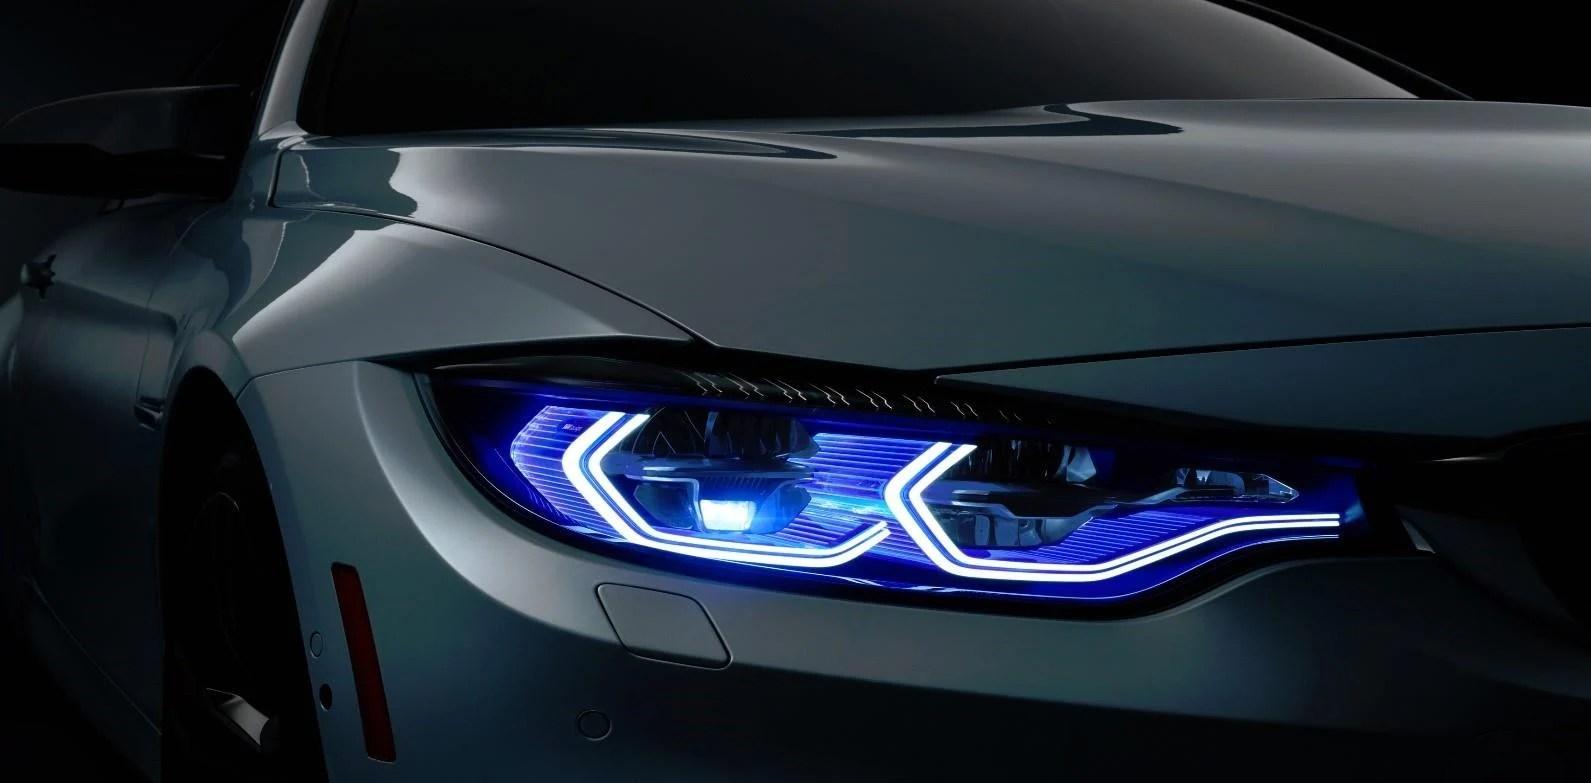 ford fiesta mk7 headlight wiring diagram single door access control a complete guide to car headlights micksgarage